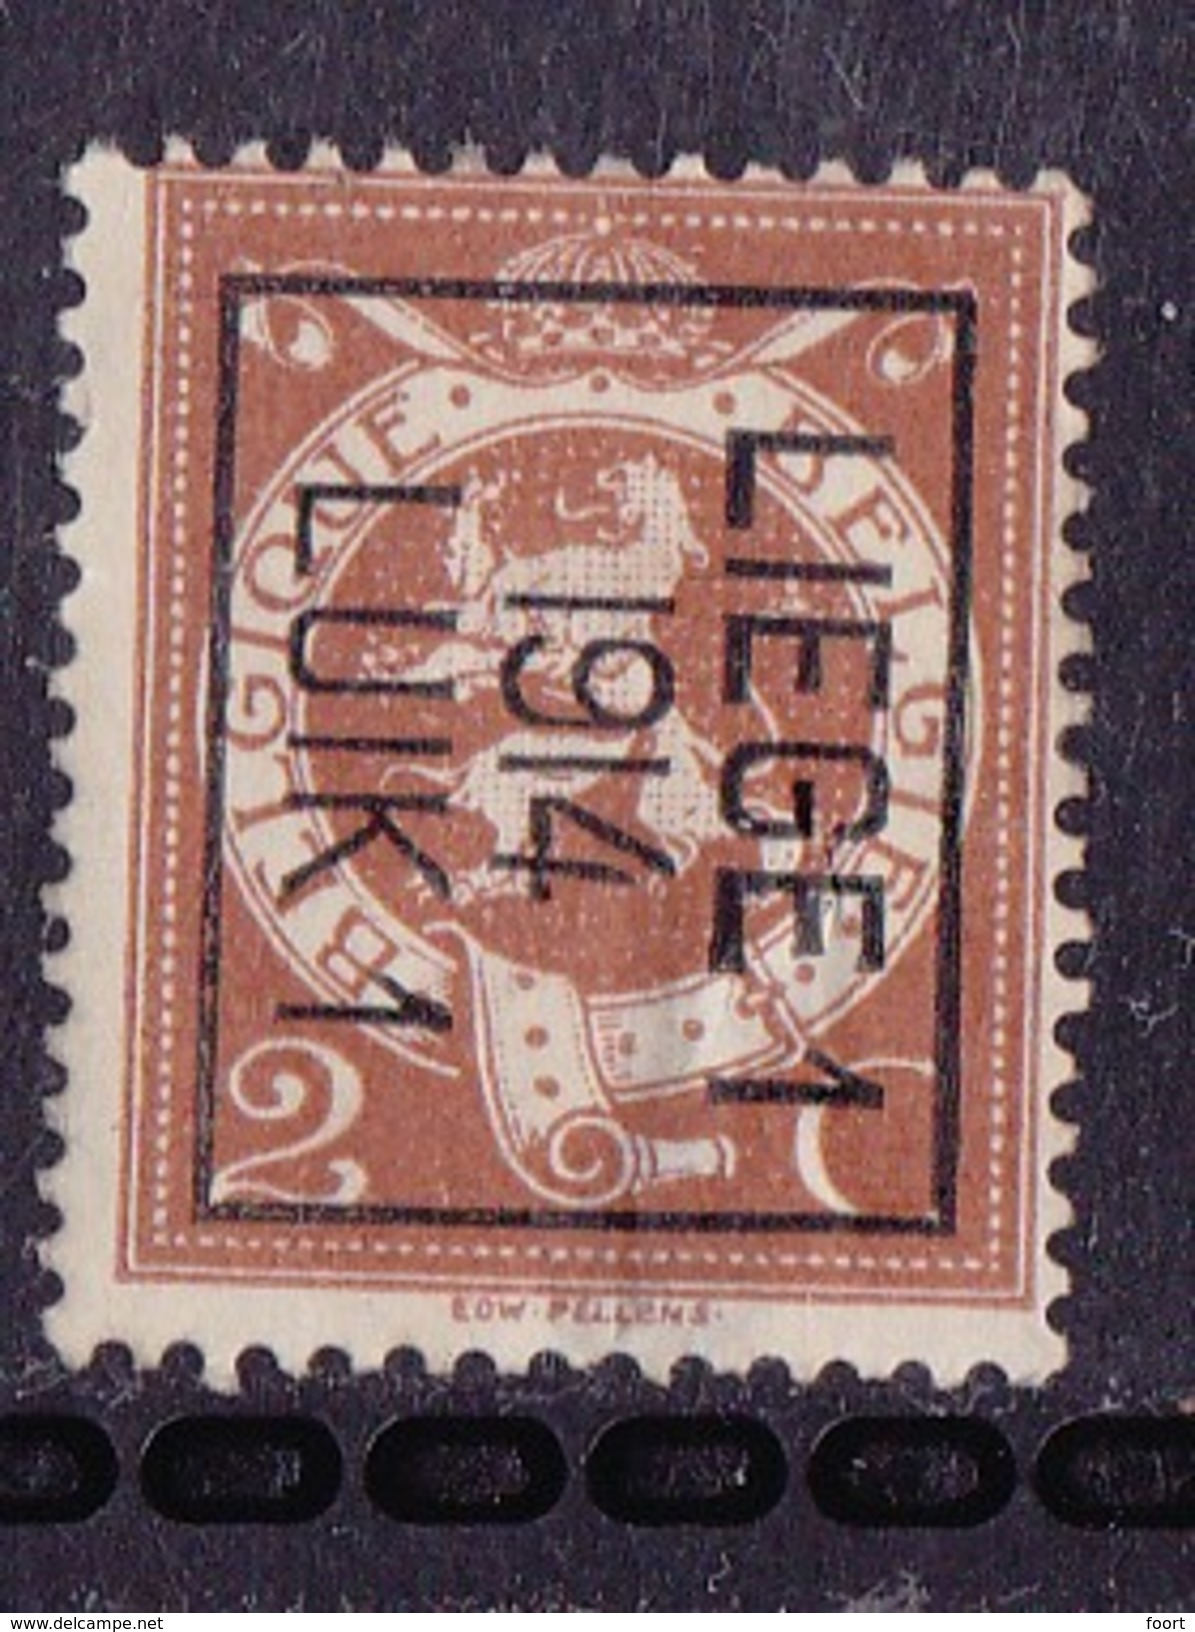 Luik  1914 Typo Nr.53Bzz  Dunne Plek - Precancels